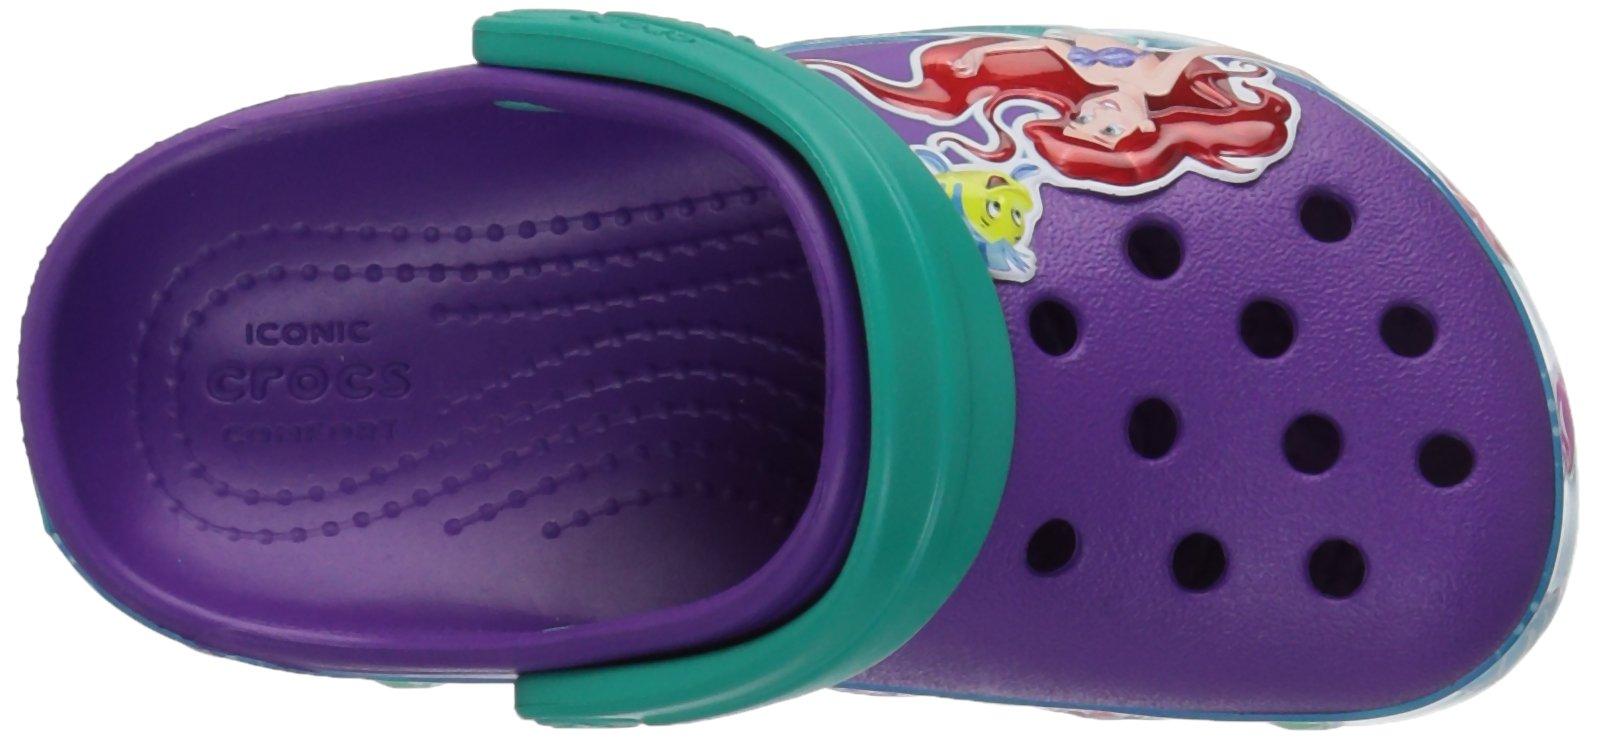 Crocs Girls' CB Princess Ariel K Clog, Amethyst, 13 M US Little Kid by Crocs (Image #8)